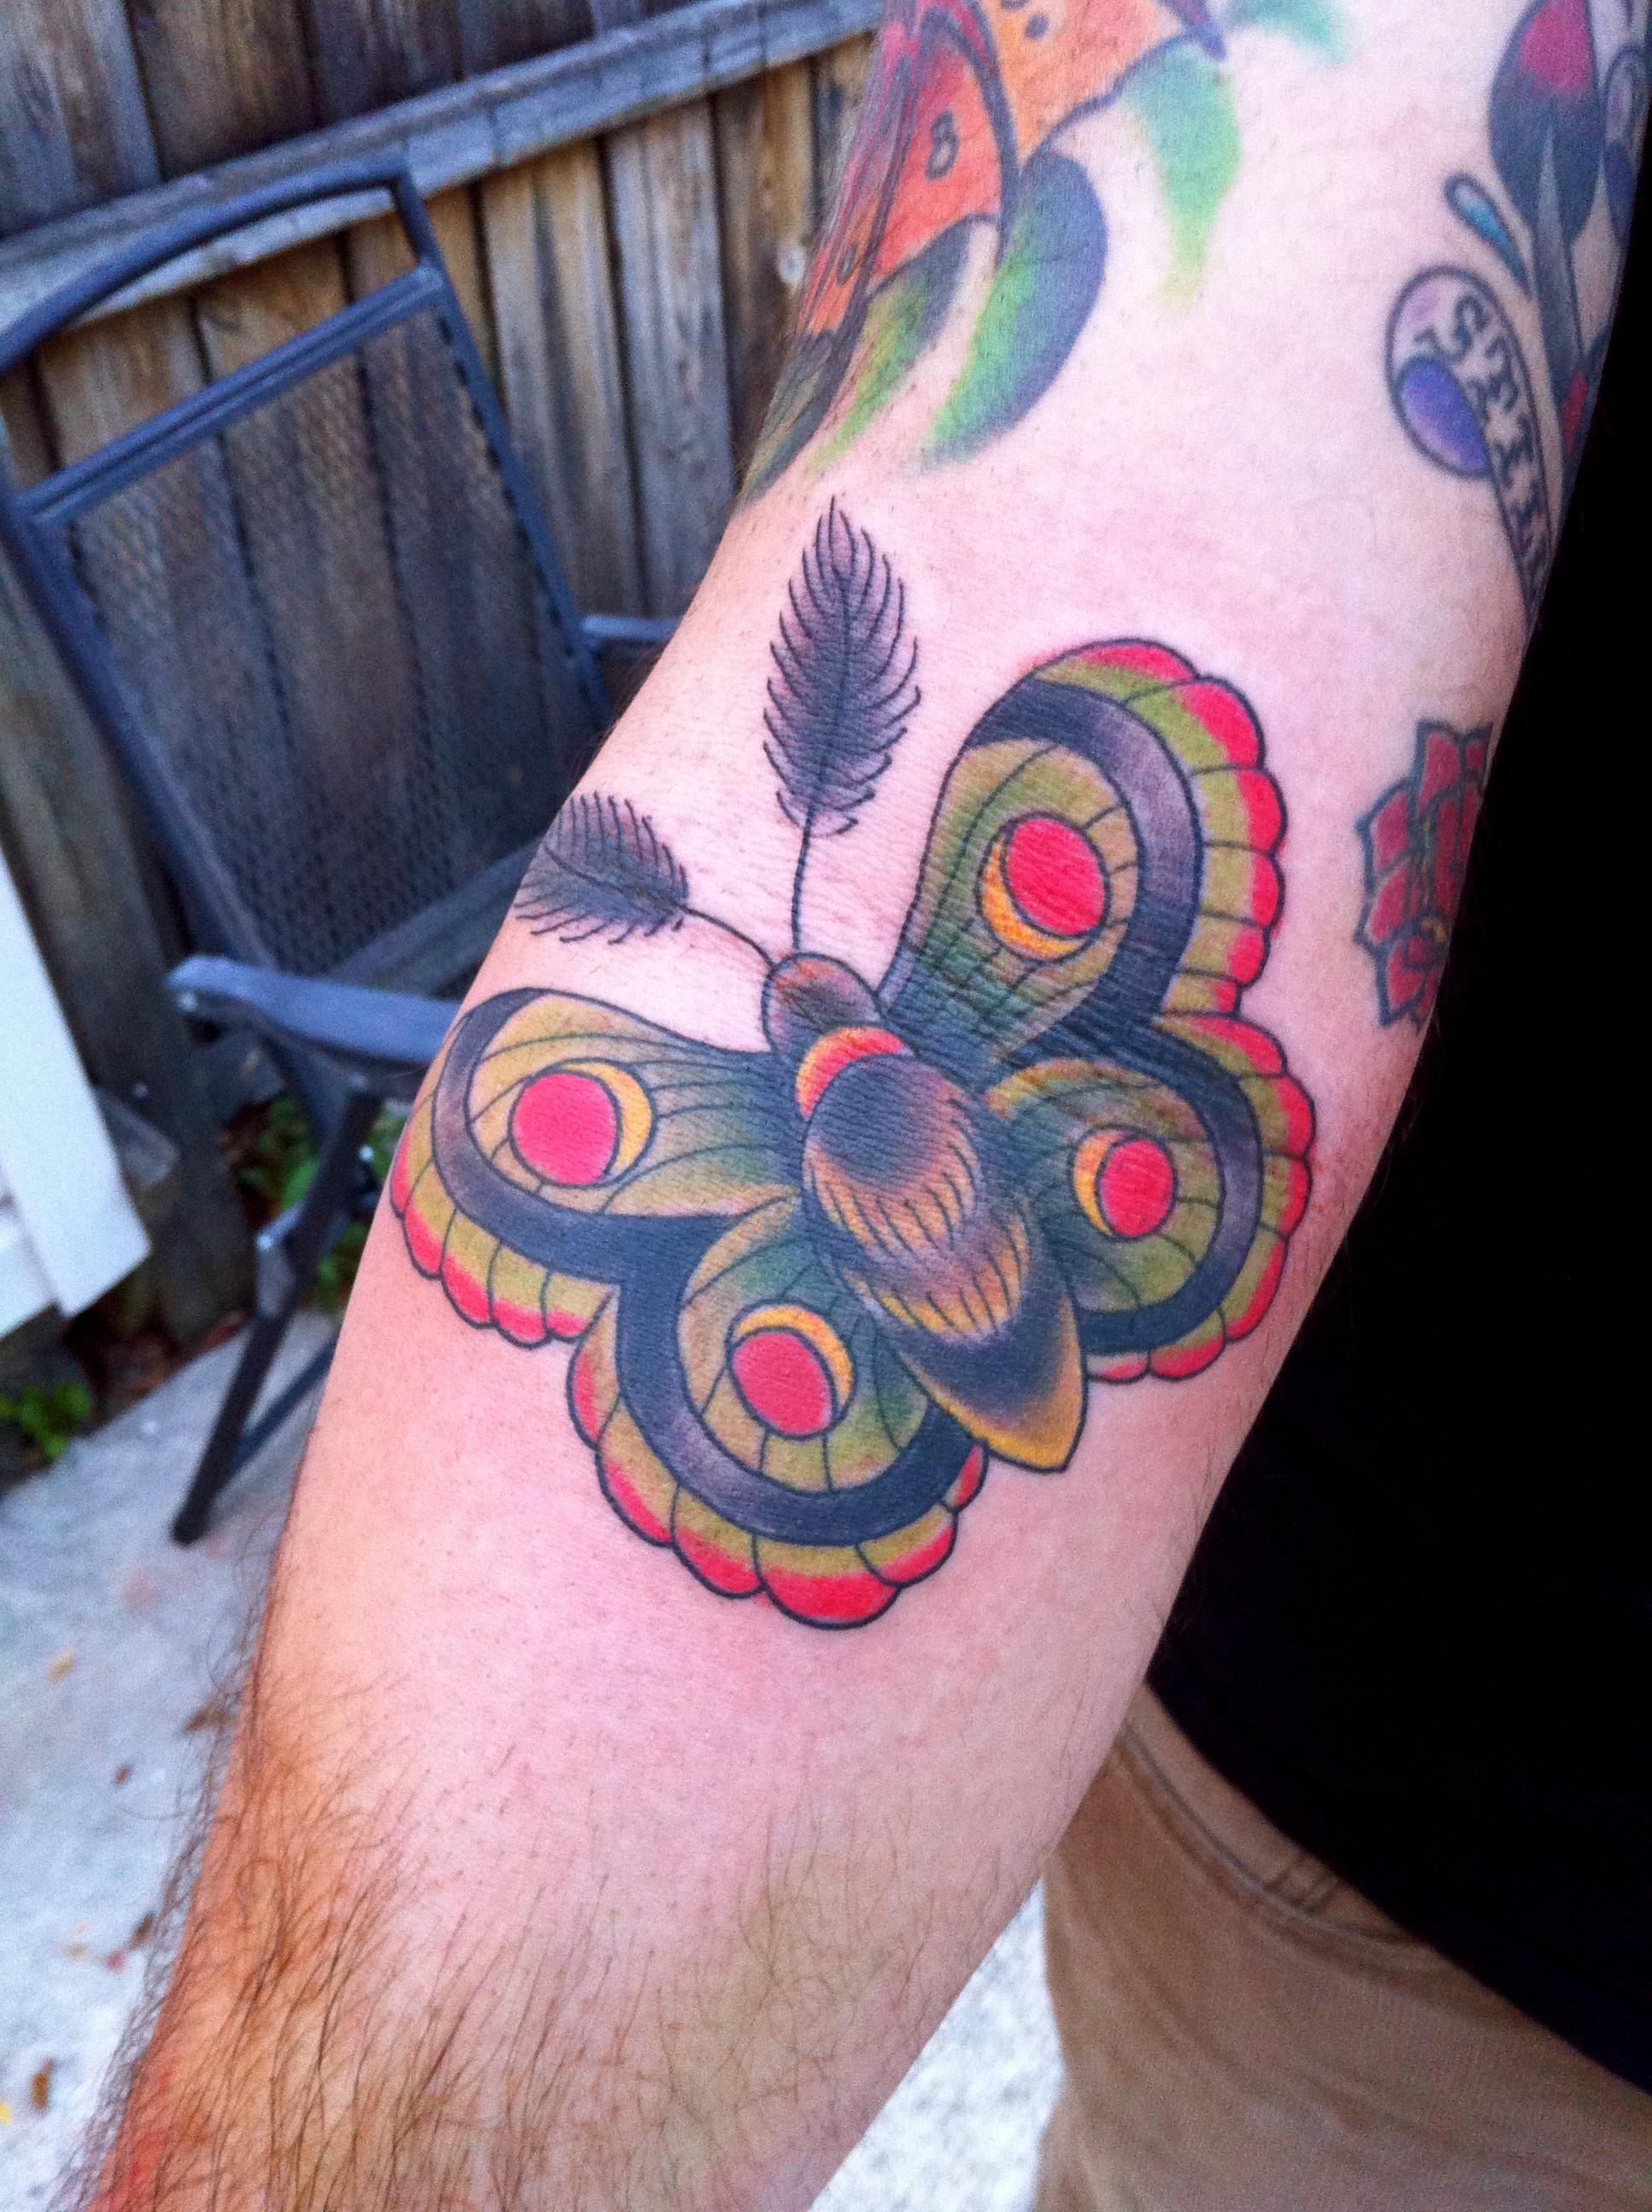 Tattoos by nick kelly tattoos by nick kelly page 3 for Fish vagina tattoo